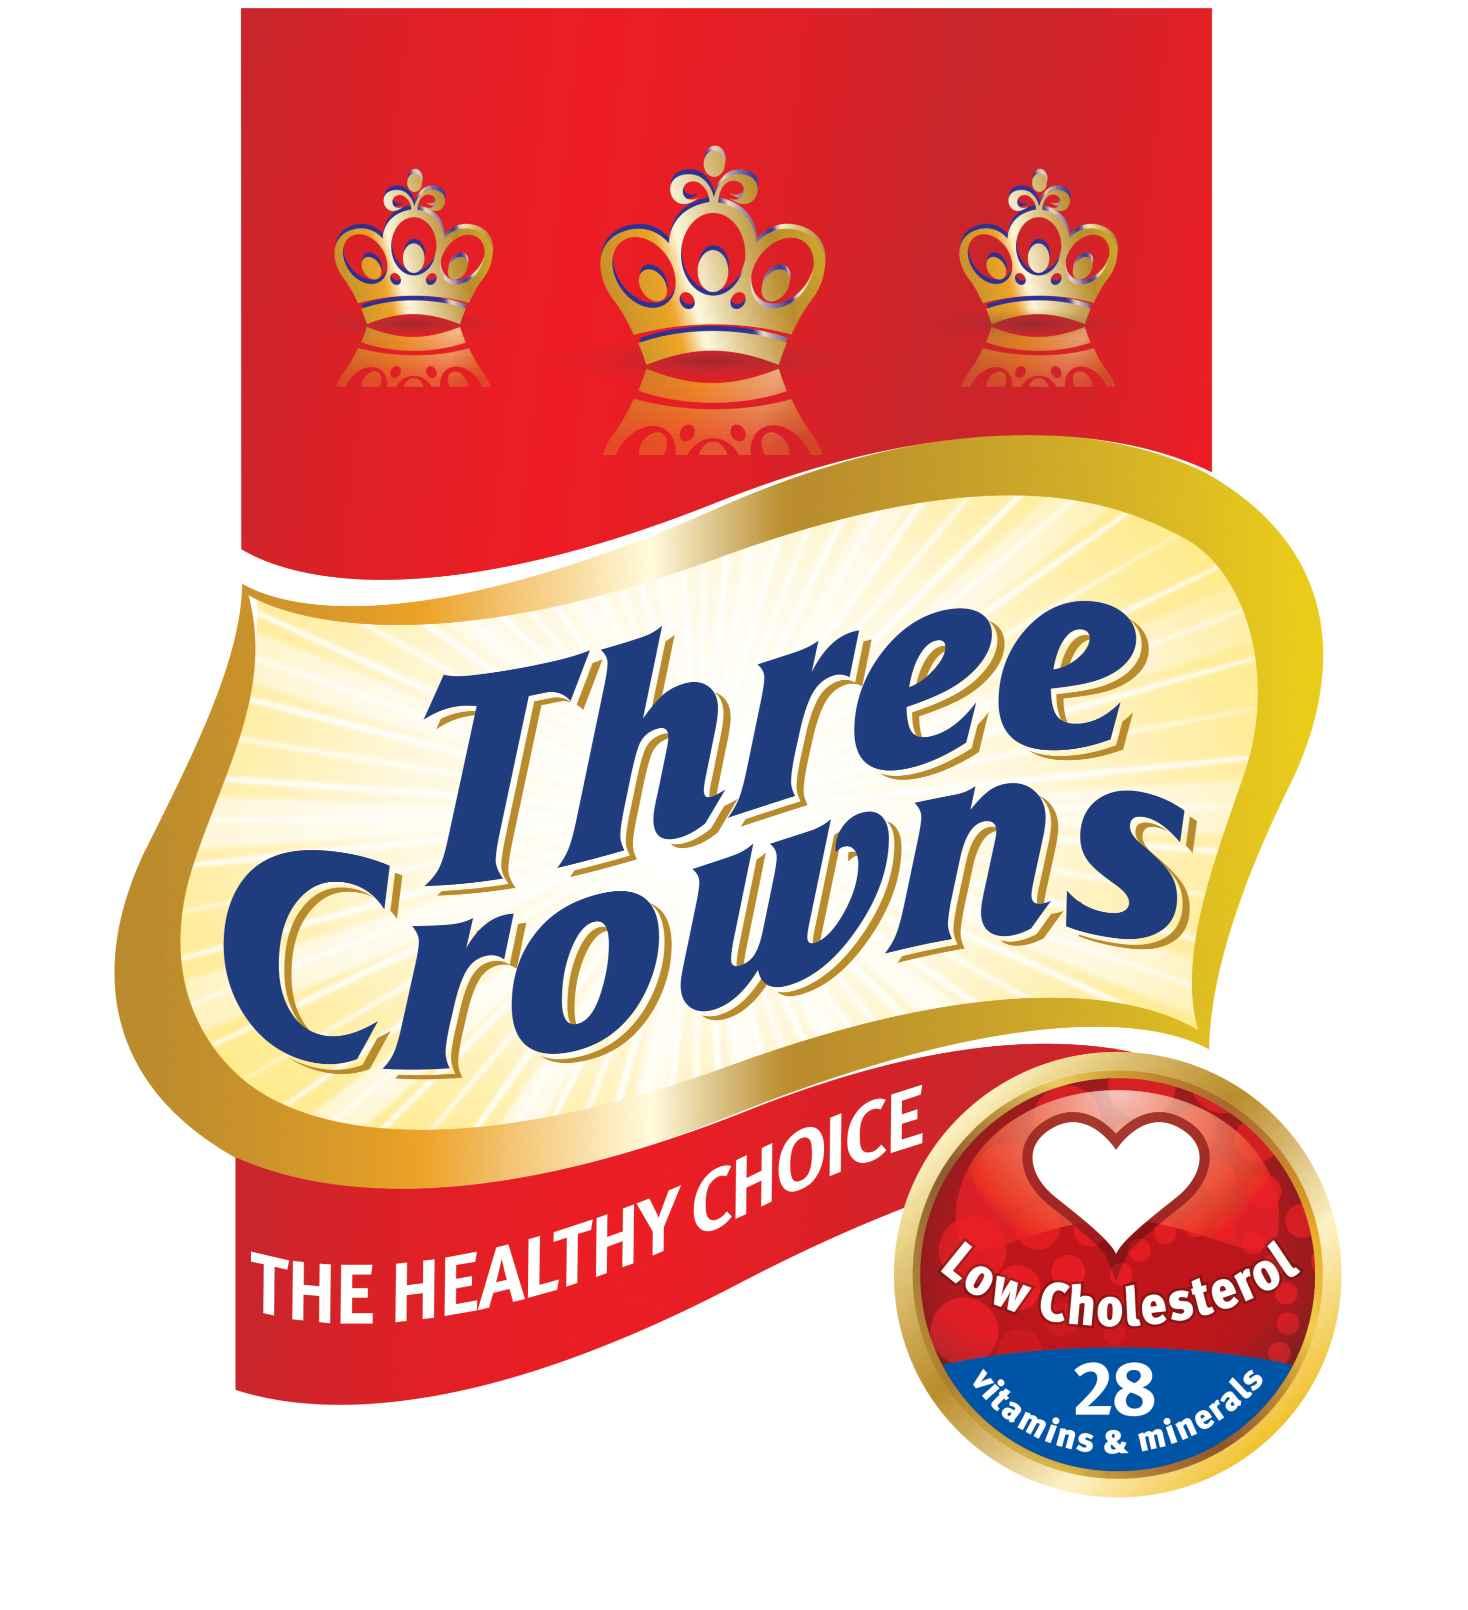 Three Crowns Milk